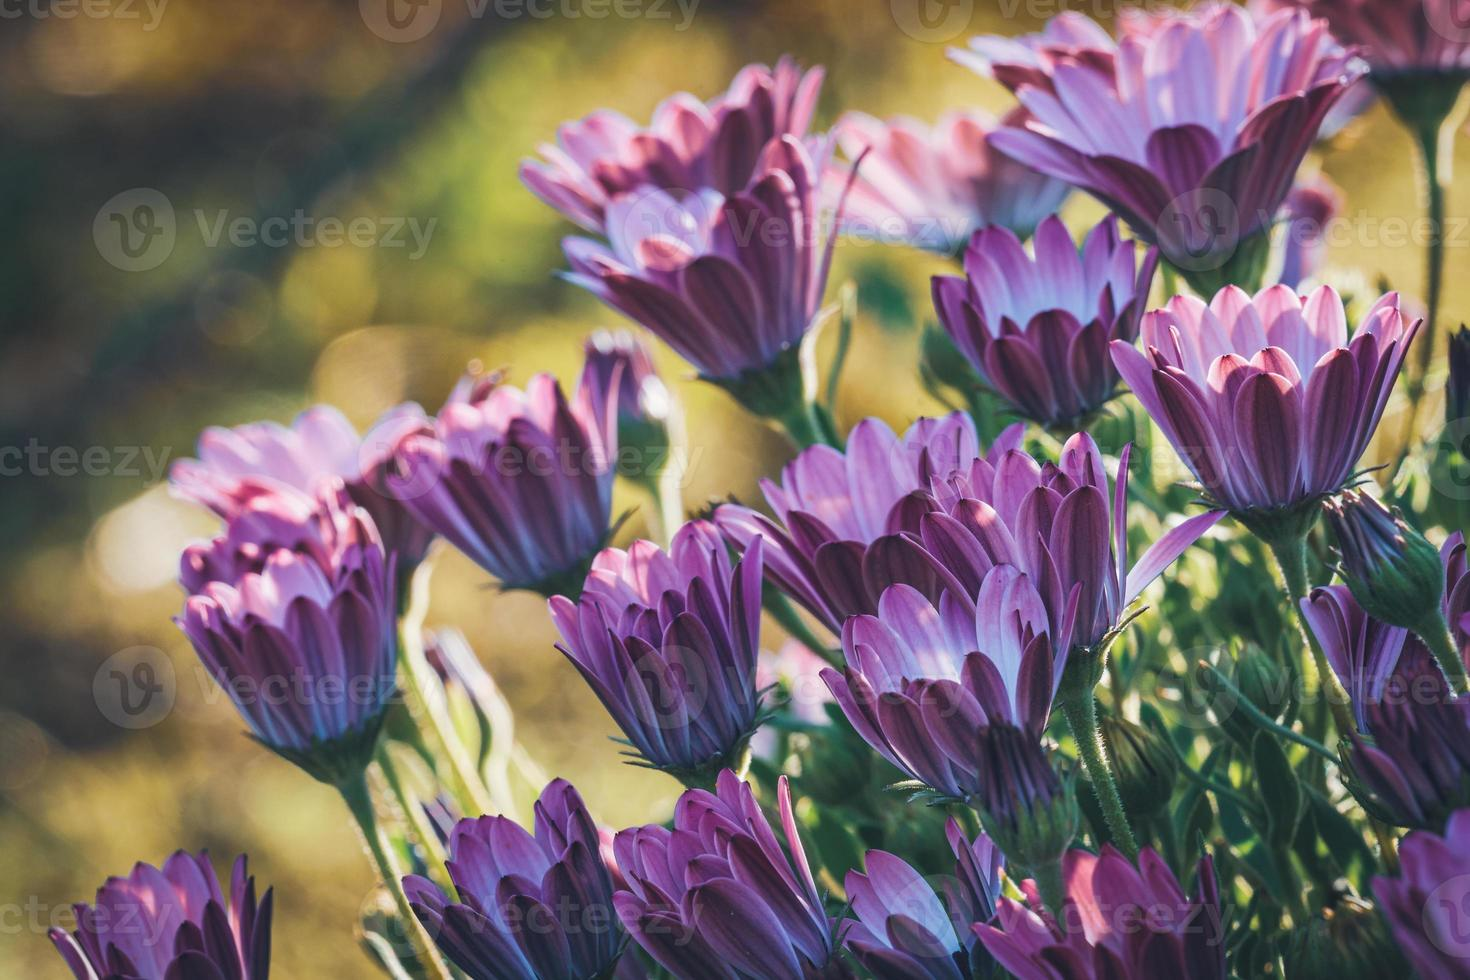 flores roxas e rosa de margarida africana foto